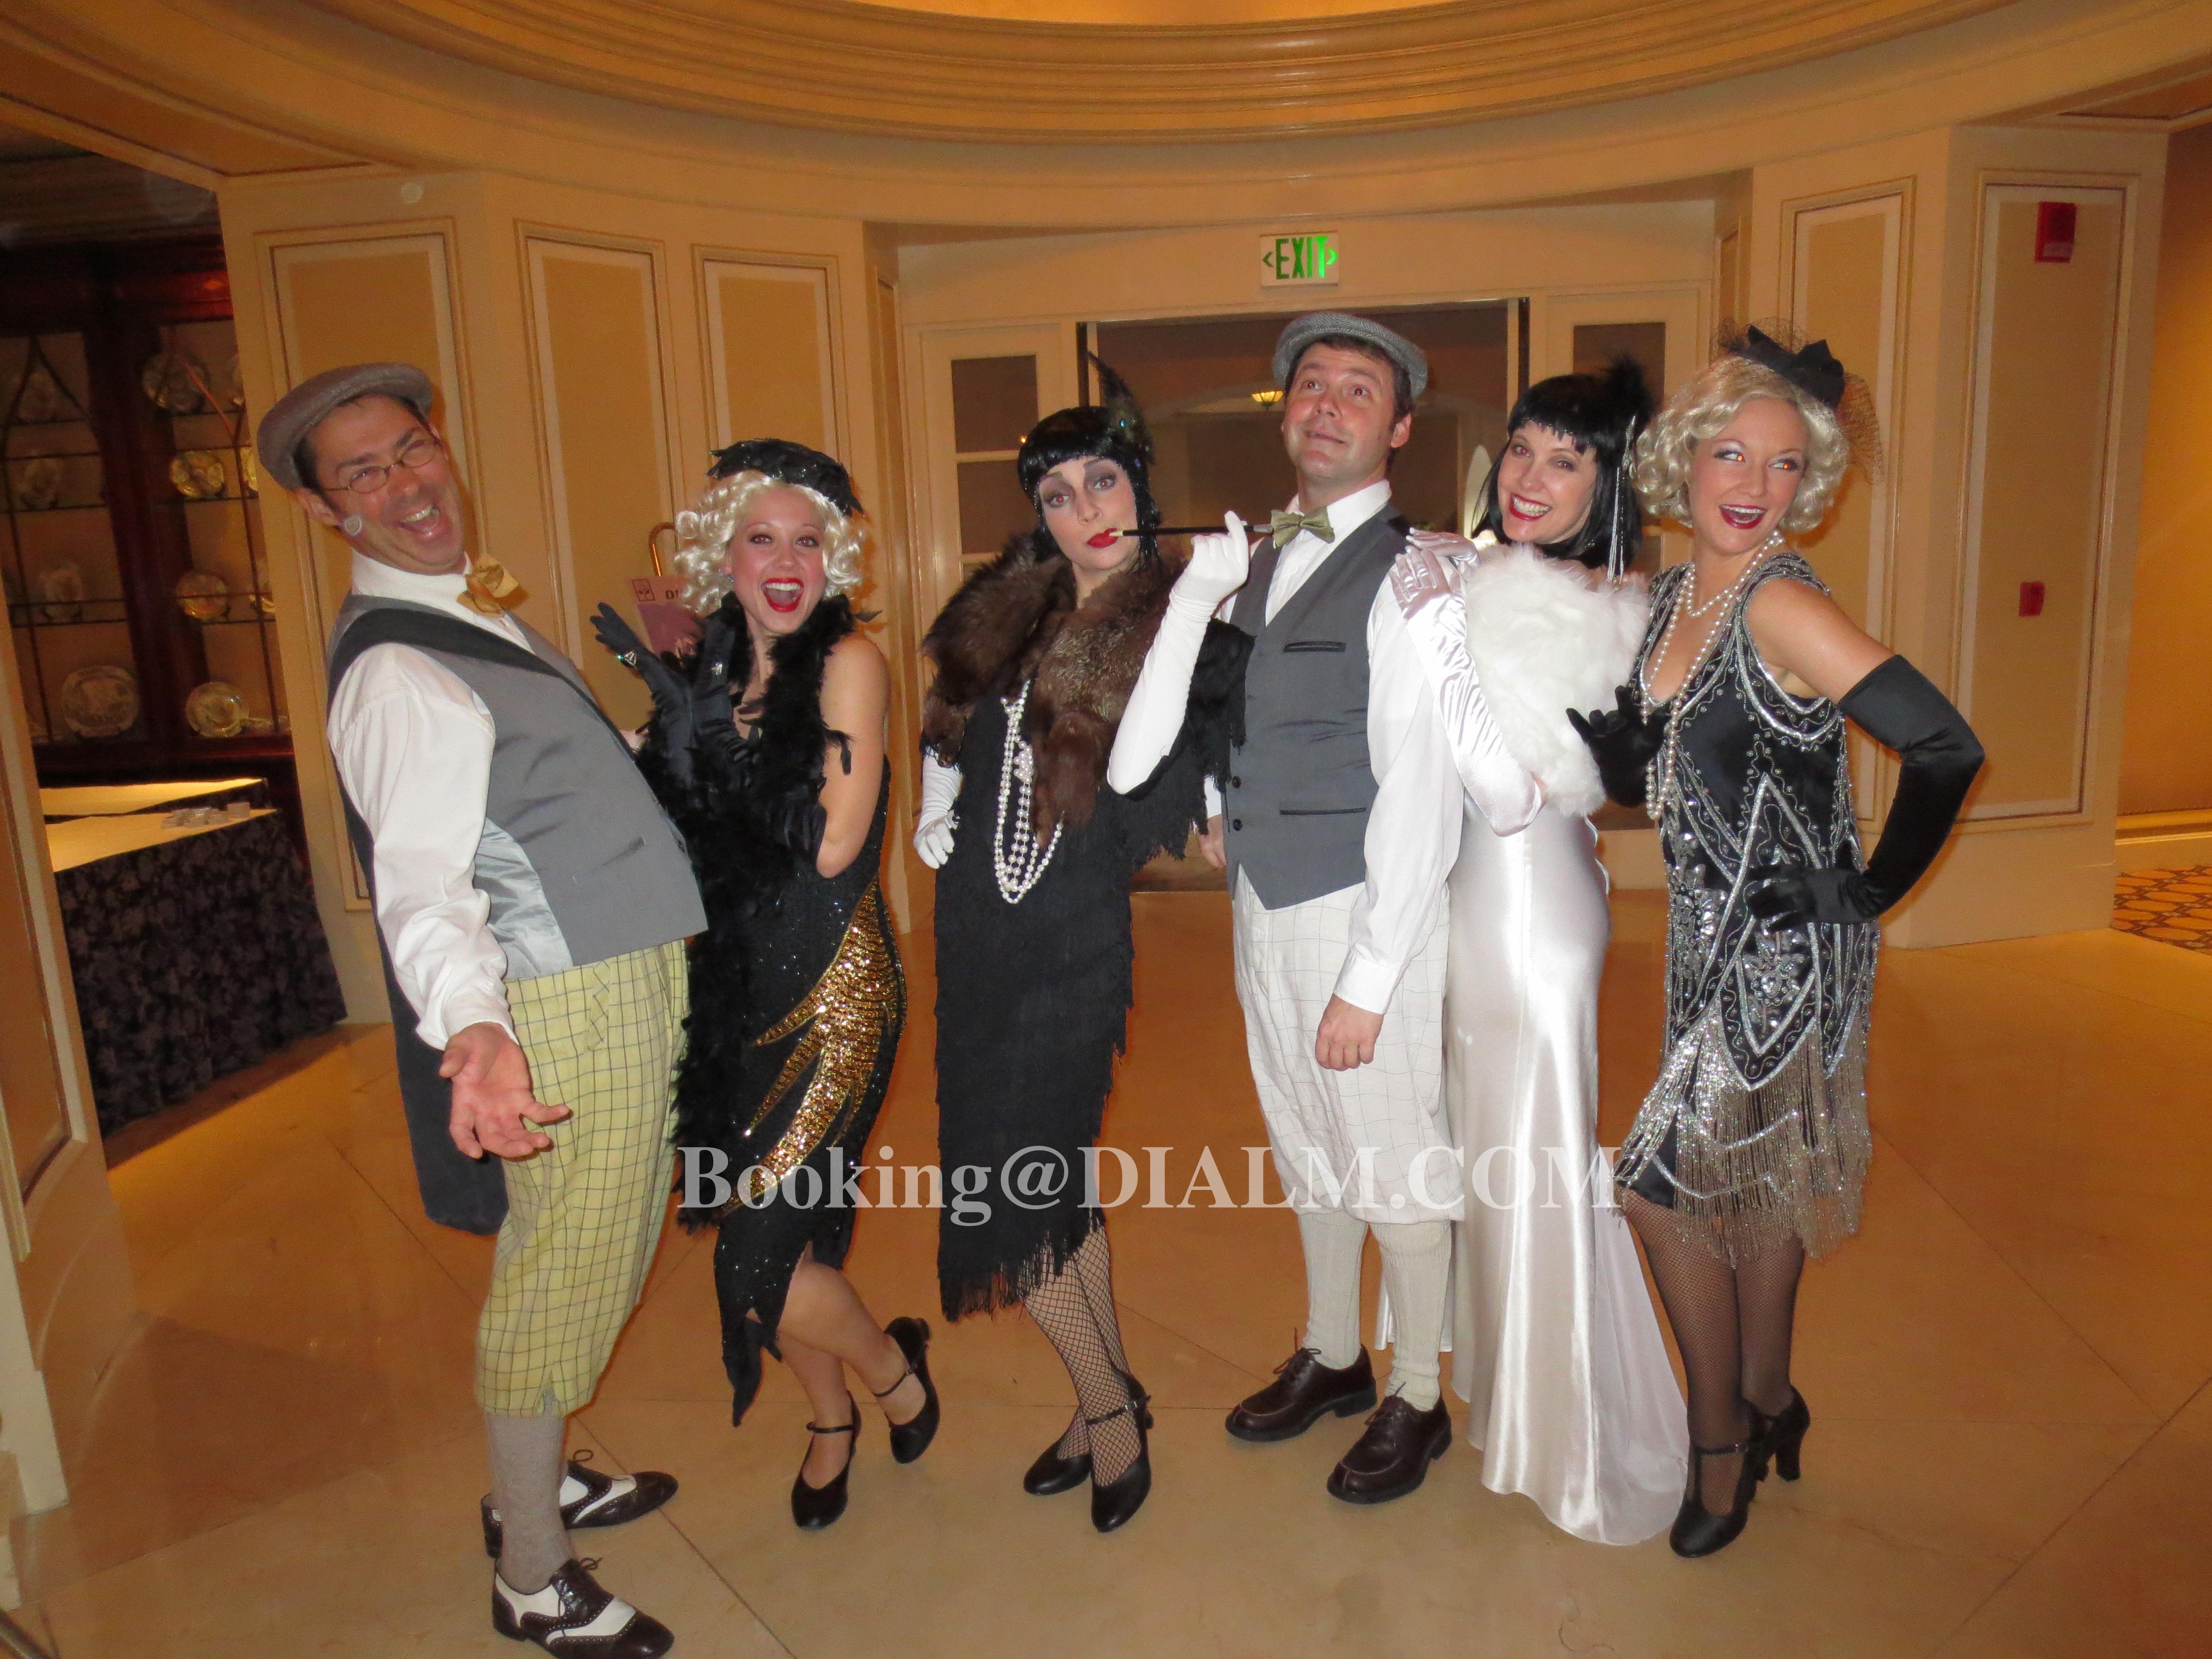 #TheGreatGatsby #1920's #GatsbyCharacters #CigaretteGirls #Flappers #Dancers #Music #ThemeParty #Mur